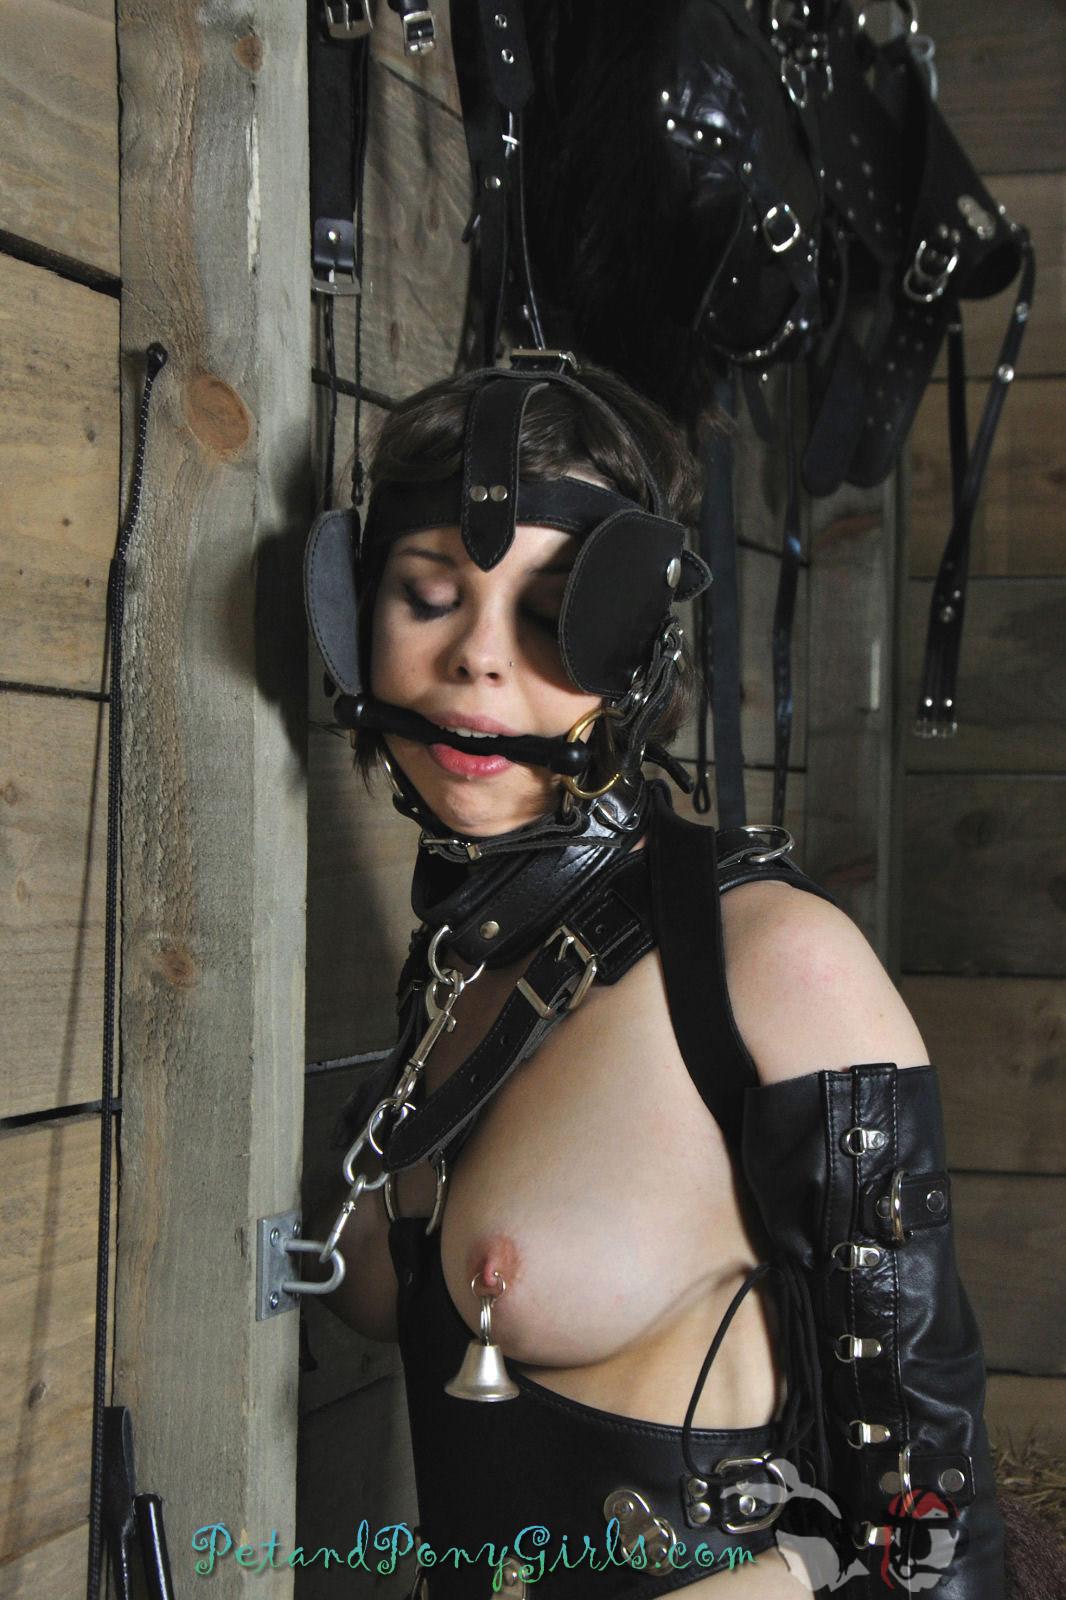 uglt girl porn galleries free mmf handjob clips porchain bondag